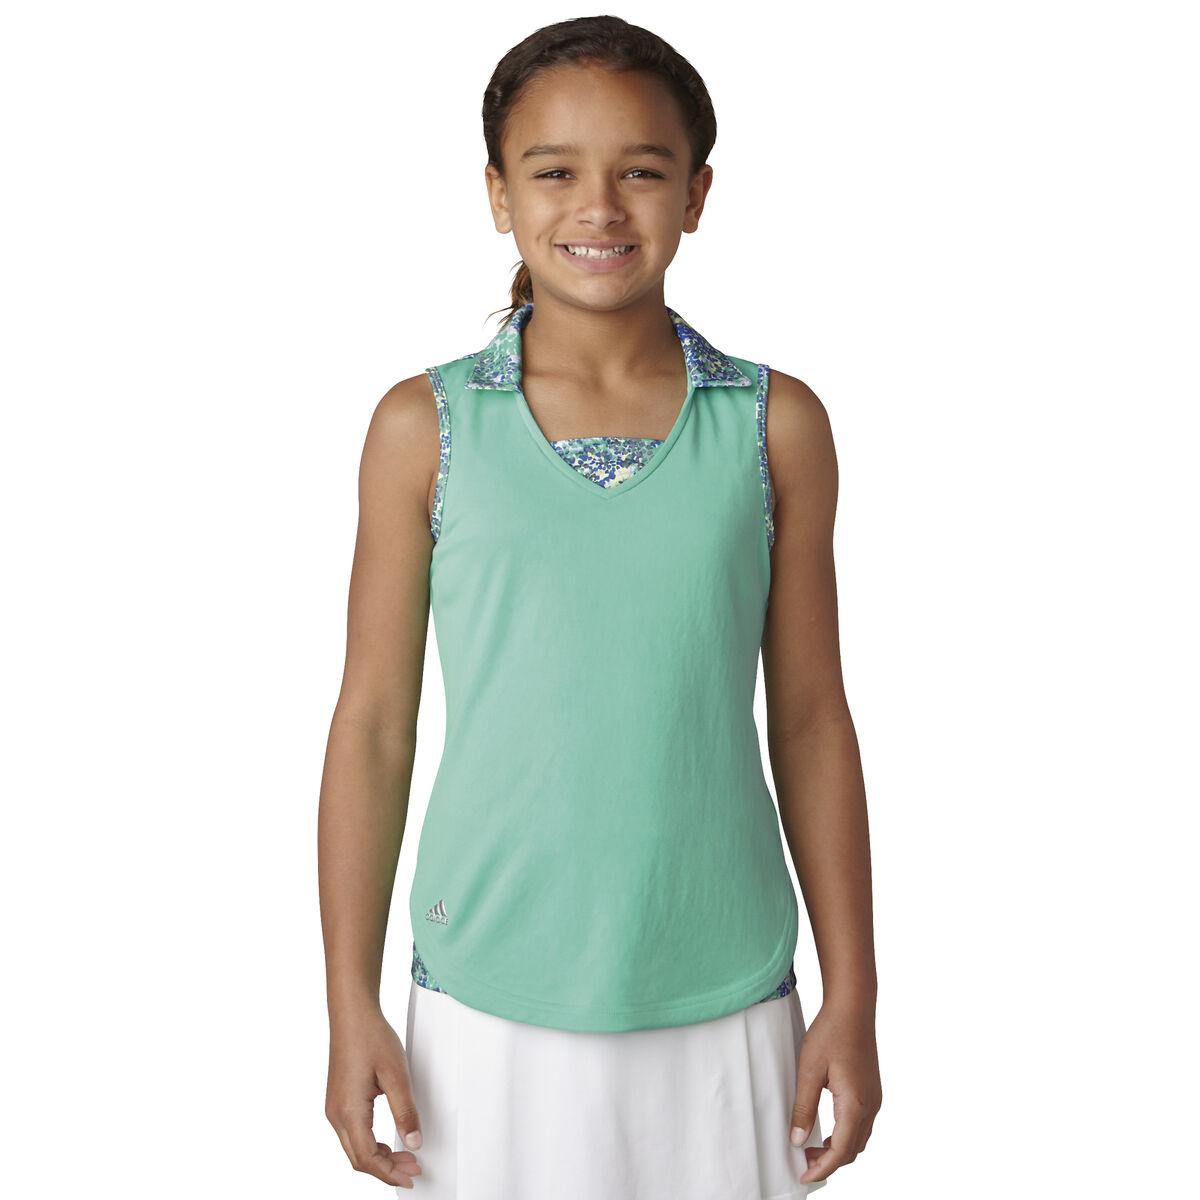 6b24914b45a48 adidas Girls' Fashion Sleeveless Polo   PGA TOUR Superstore